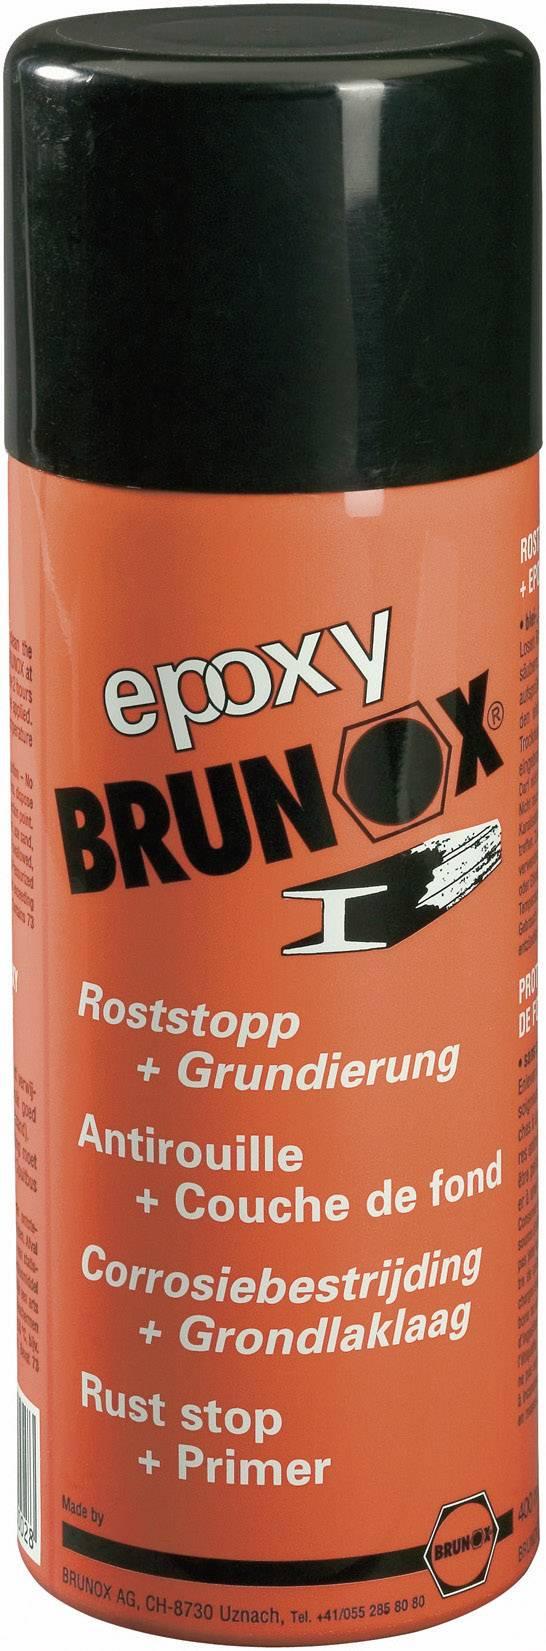 Brunox EPOXY BR0,40EP, 400 ml